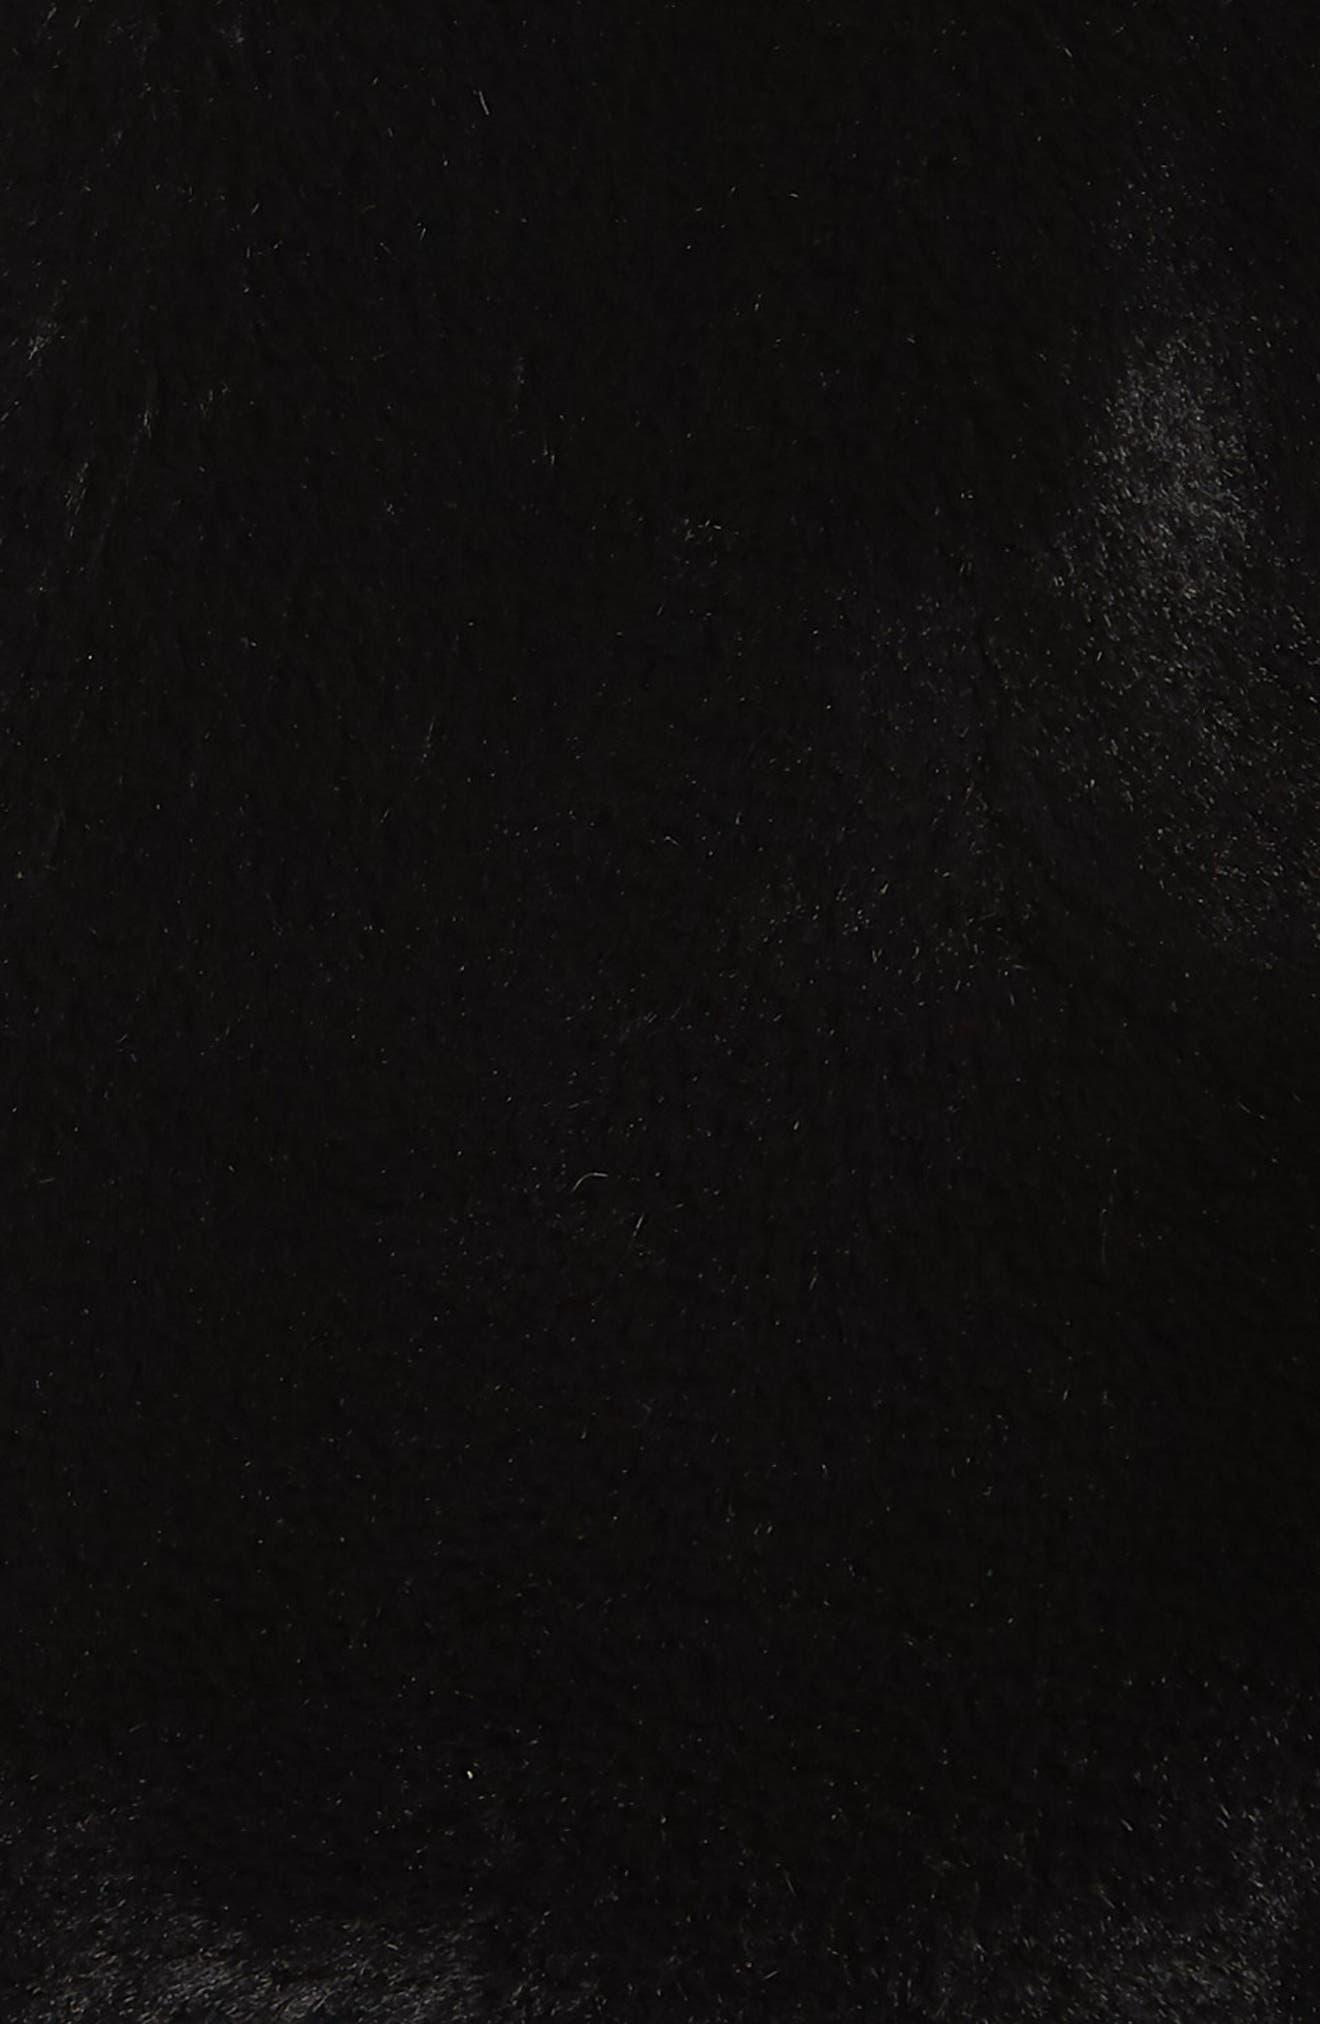 Half-Zip Faux Fur Sweatshirt,                             Alternate thumbnail 5, color,                             Black